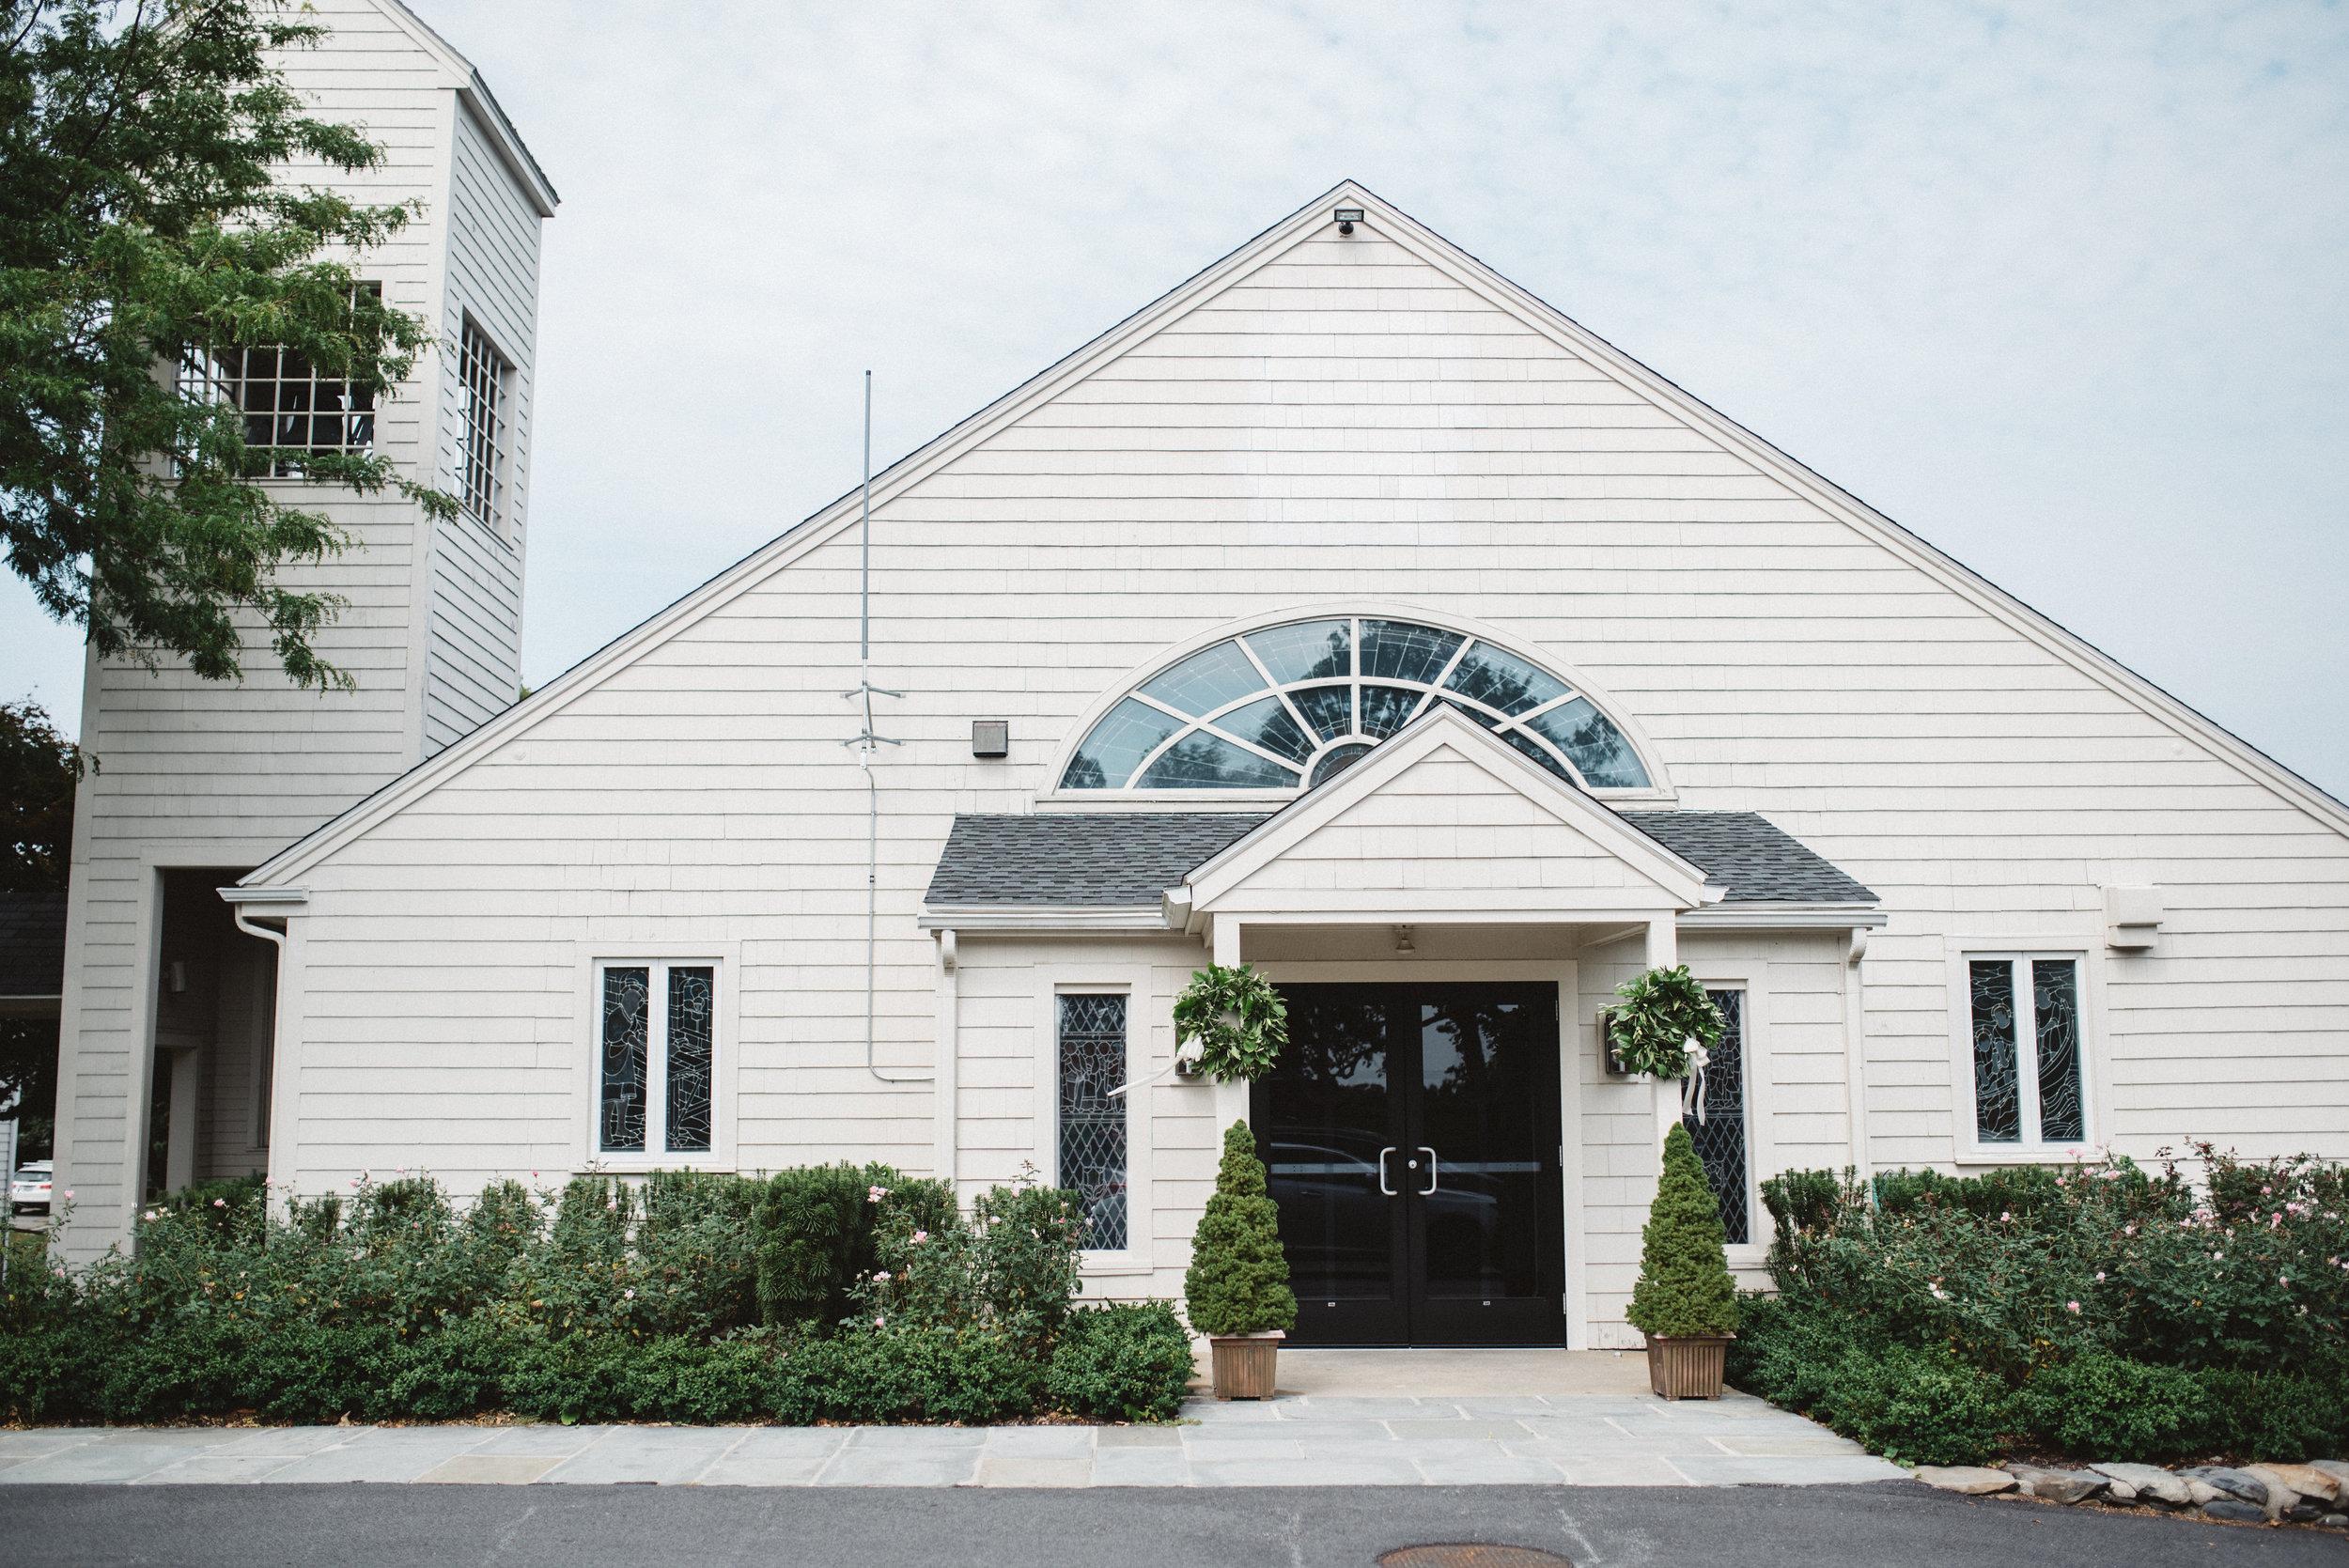 St. Catherine's Church, Little compton, RI